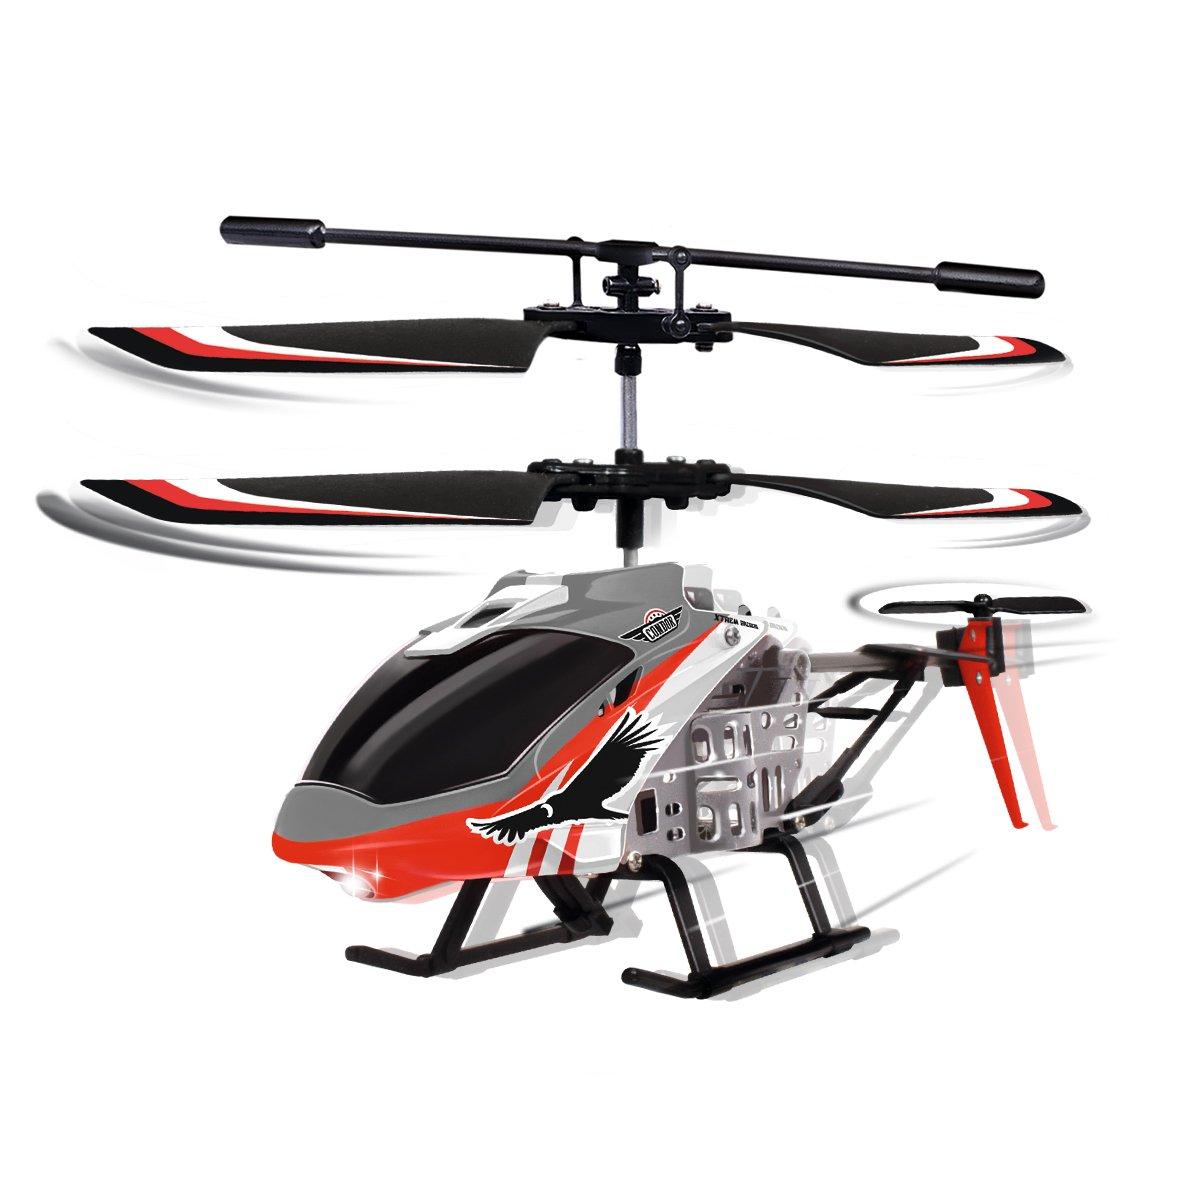 teledirigidos Aviones a Control Remoto Worldbrands XT280730 radiocontrol Xtrem Raiders- Police Squad helicopteros RC Juguete